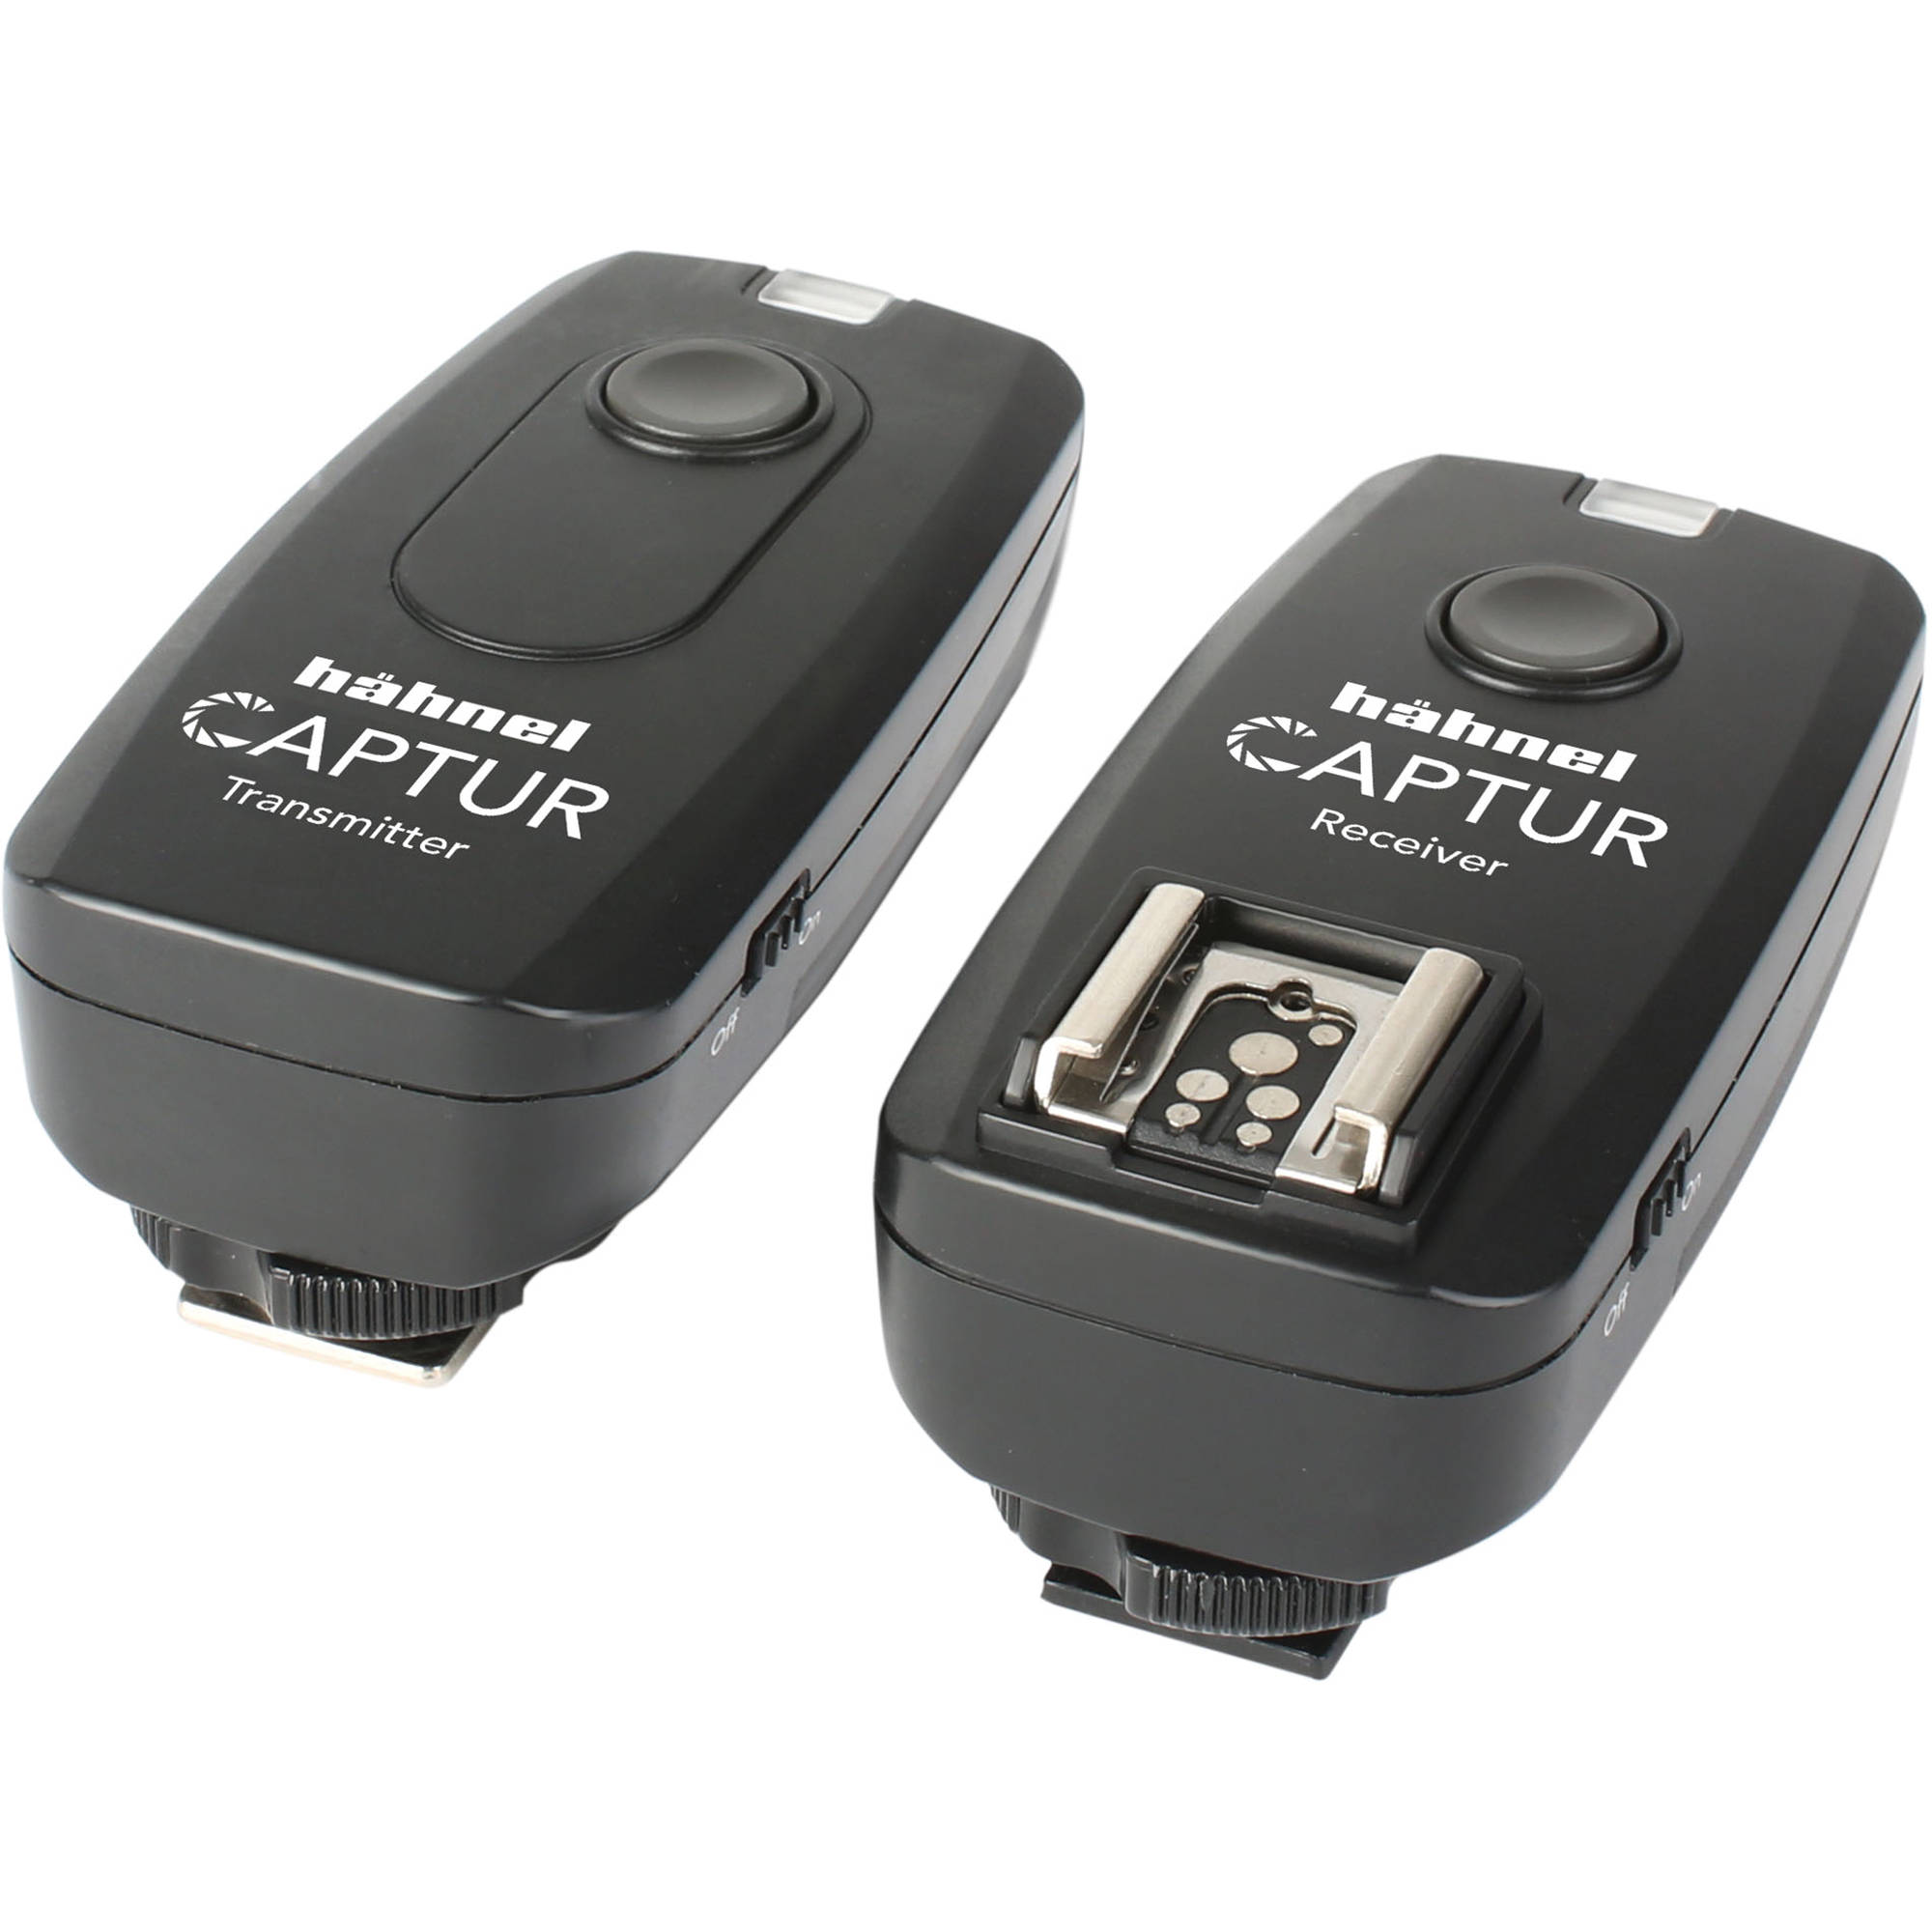 Hahnel Captur Remote Control And Flash Trigger Hl Captur